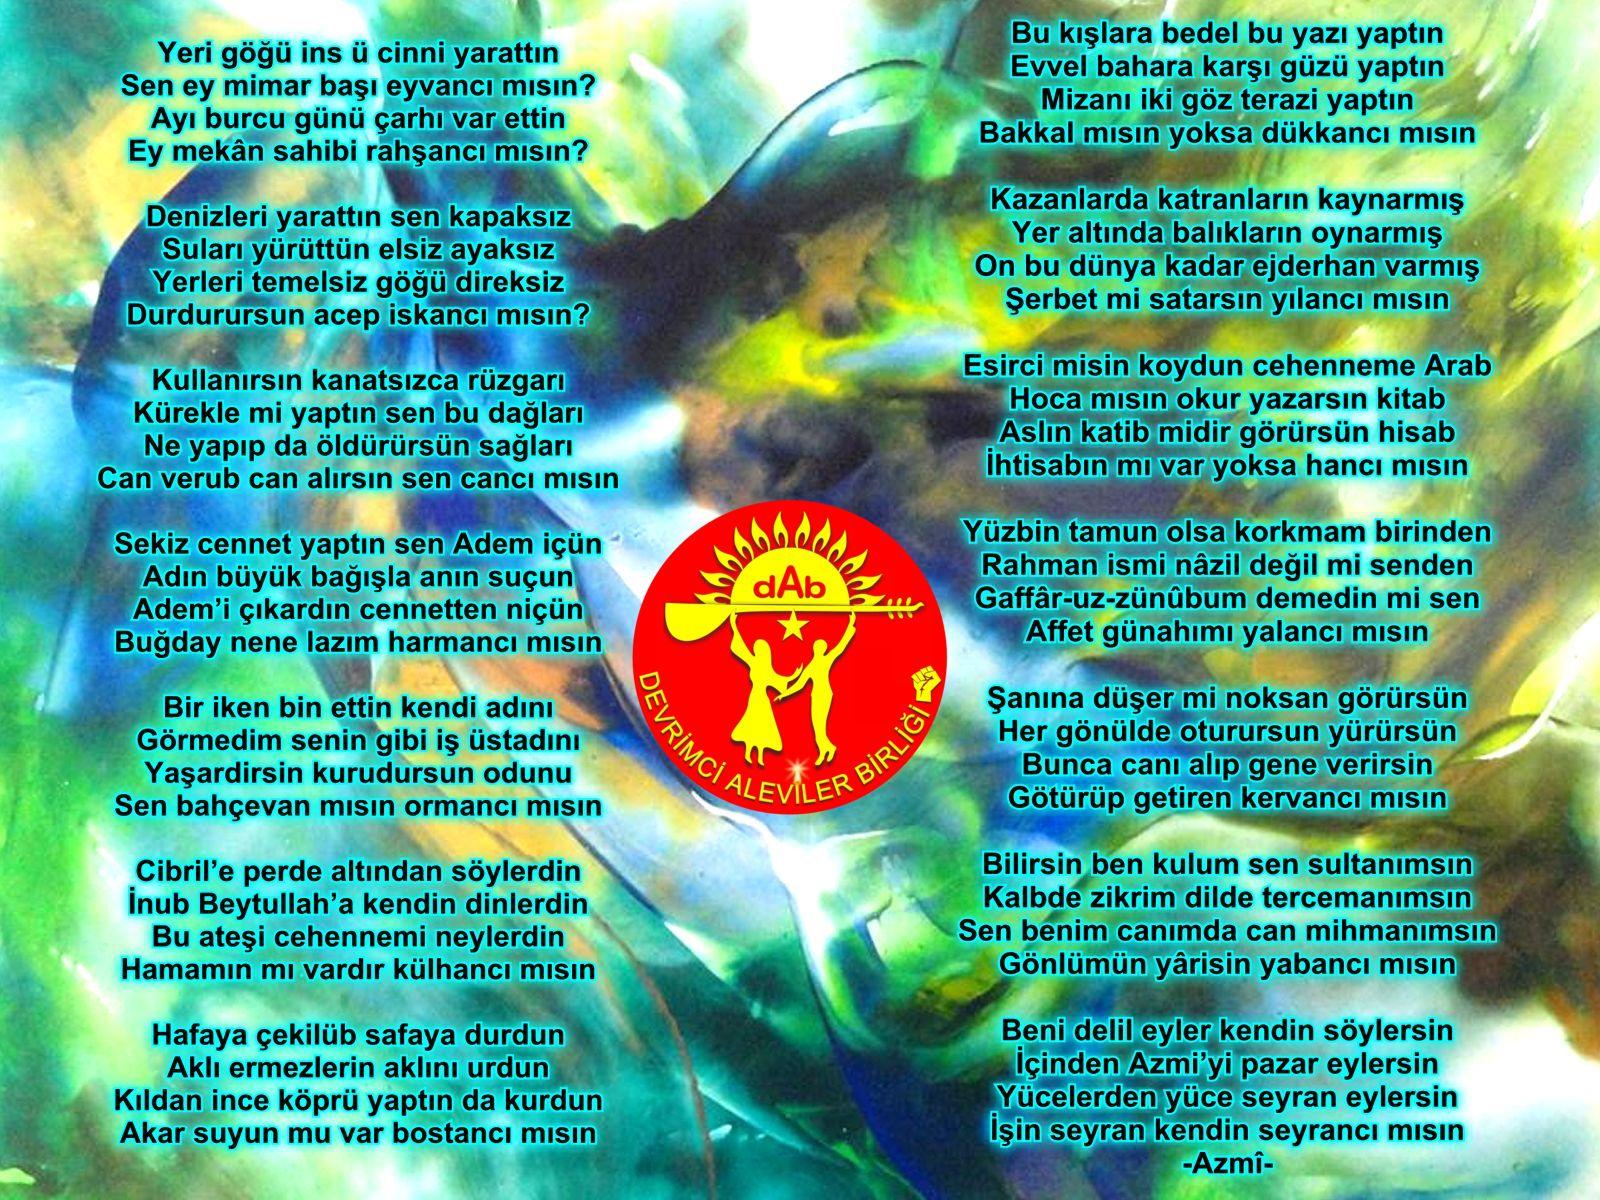 Alevi Bektaşi Kızılbaş Pir Sultan Devrimci Aleviler Birliği DAB seyranci